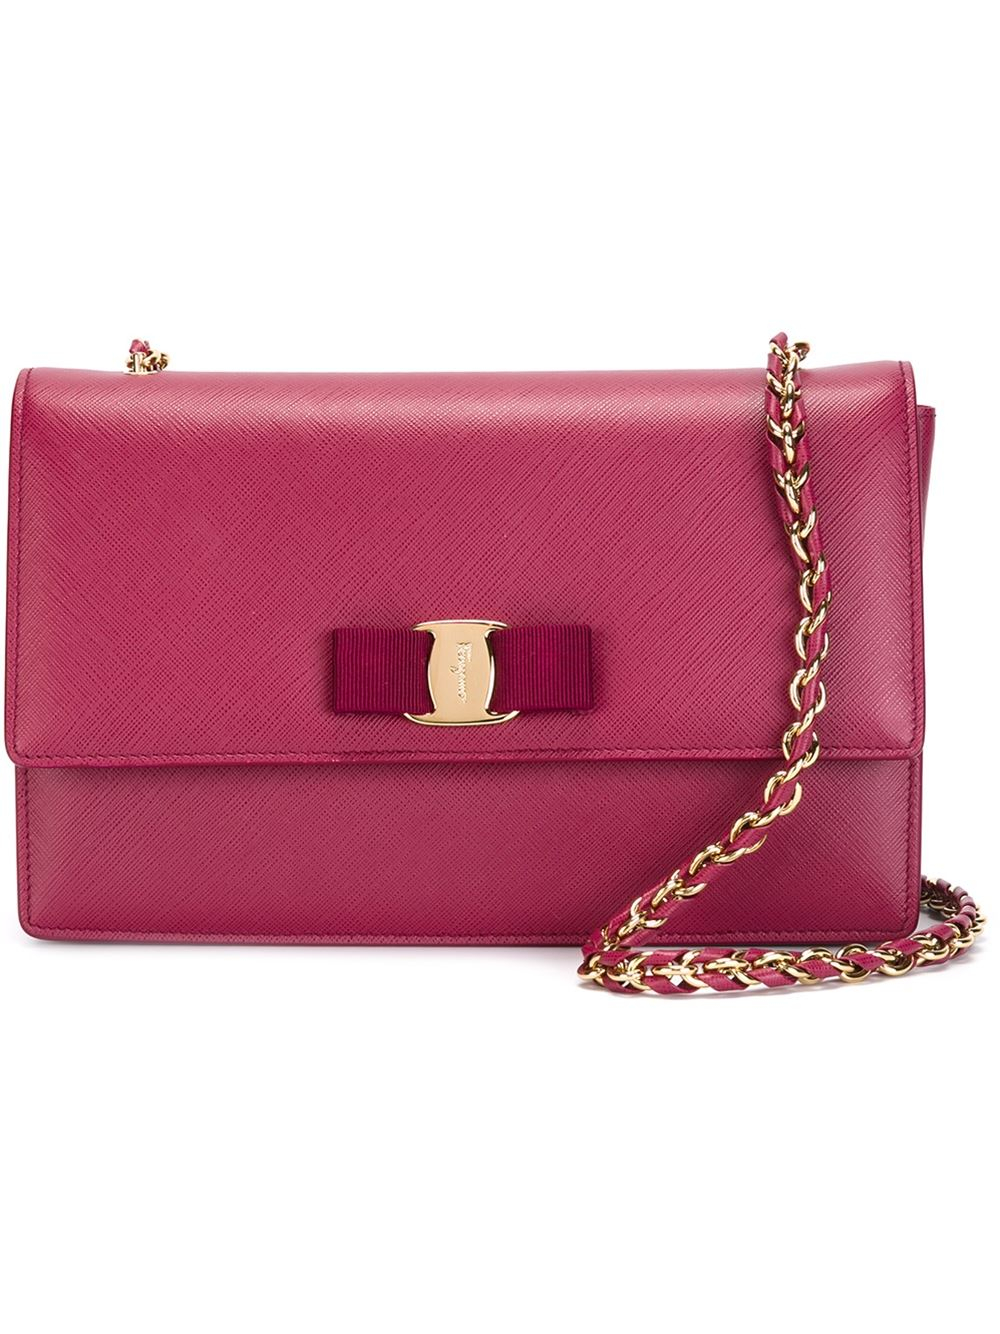 Salvatore Ferragamo Quilted Crossbody Bag  half off 65dc9 65a1b Lyst - Ferragamo  Ginny Leather Cross-Body Bag in Pink ... b4c8be5927